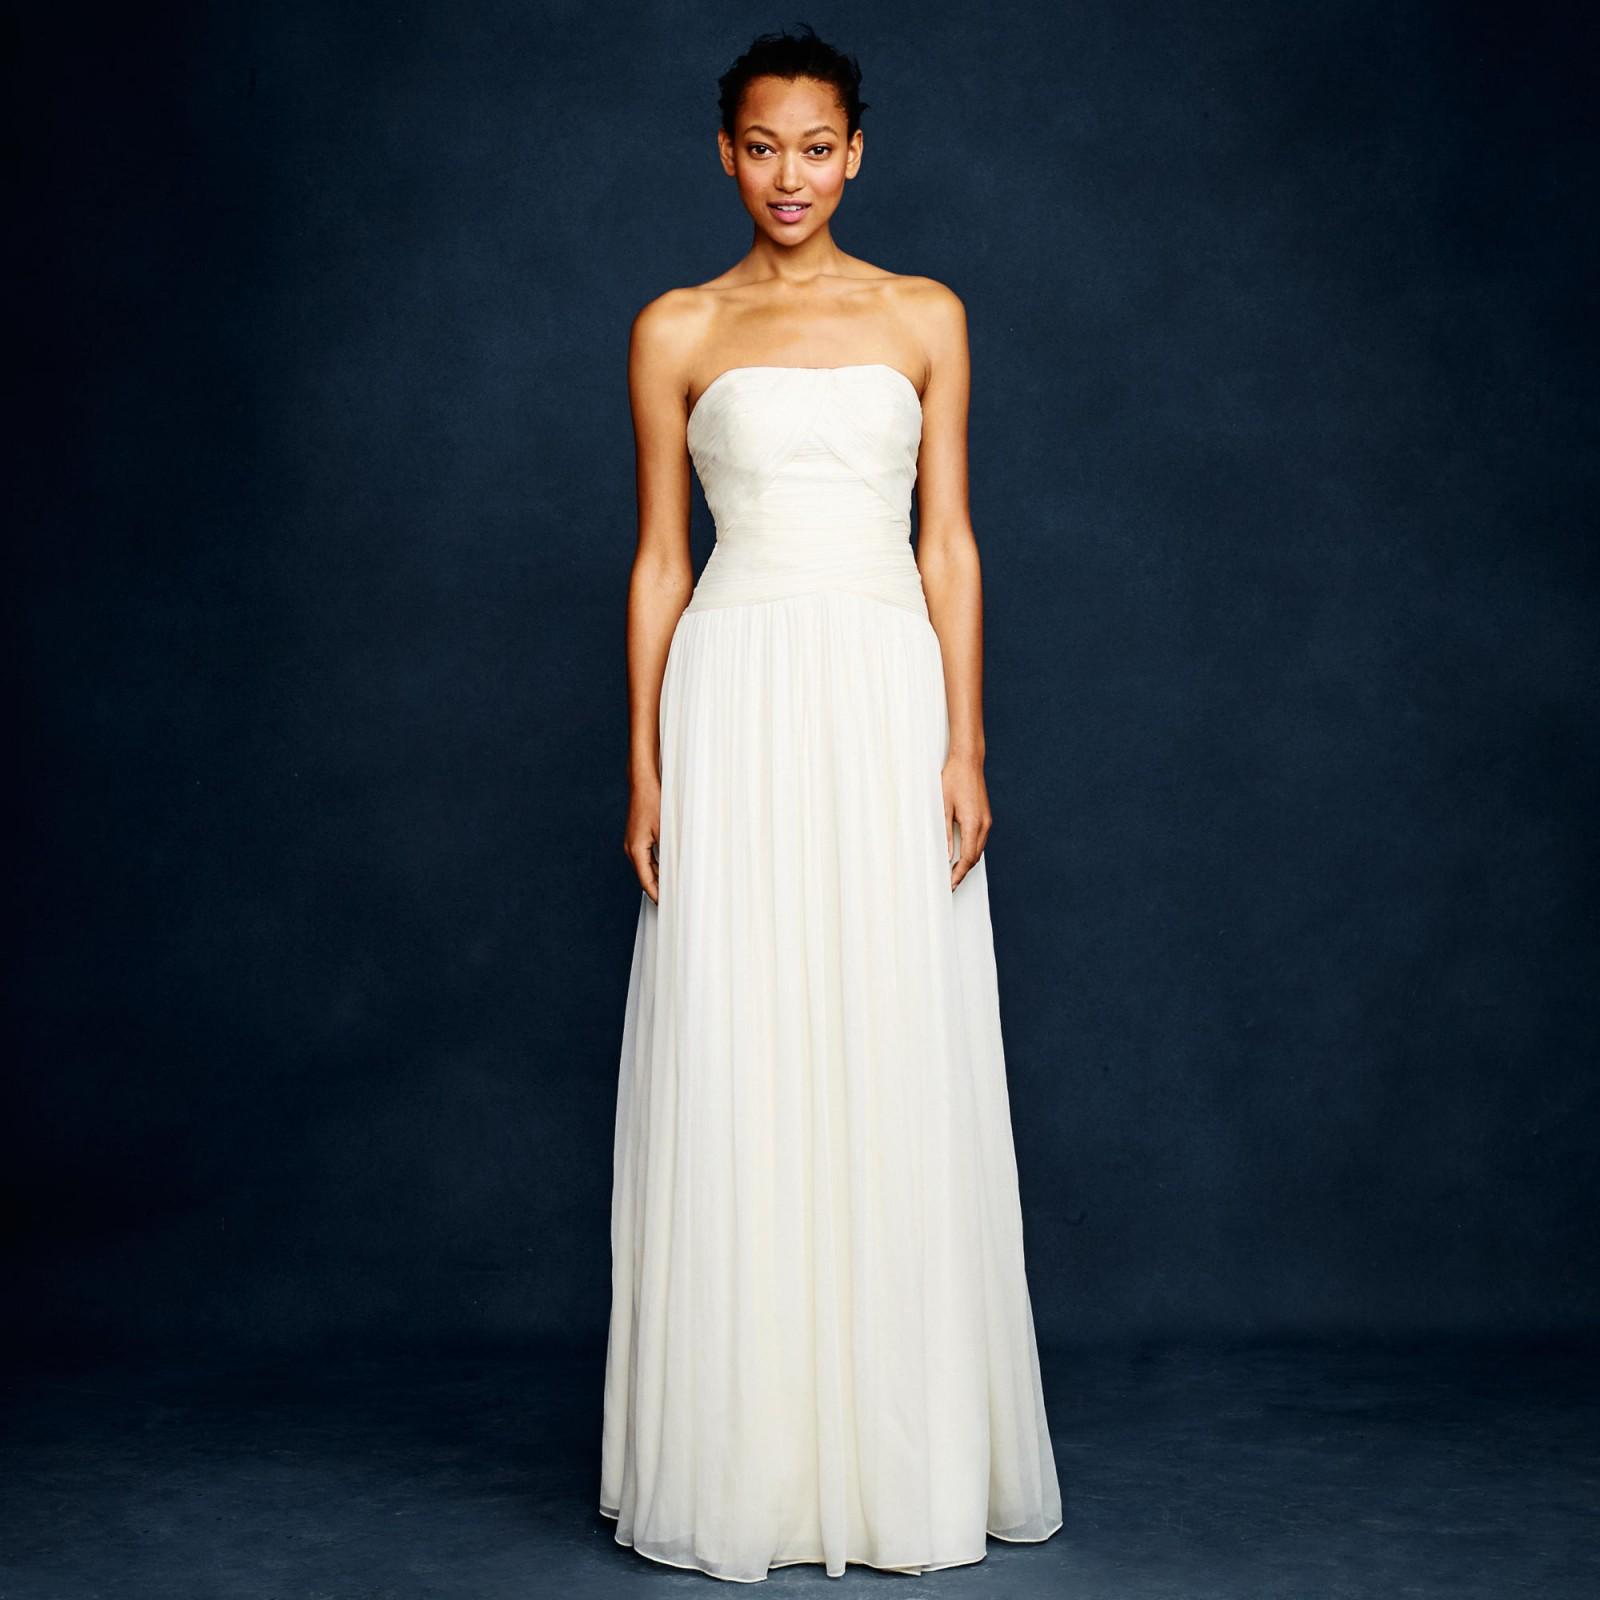 J Crew Wedding Dresses On Sale